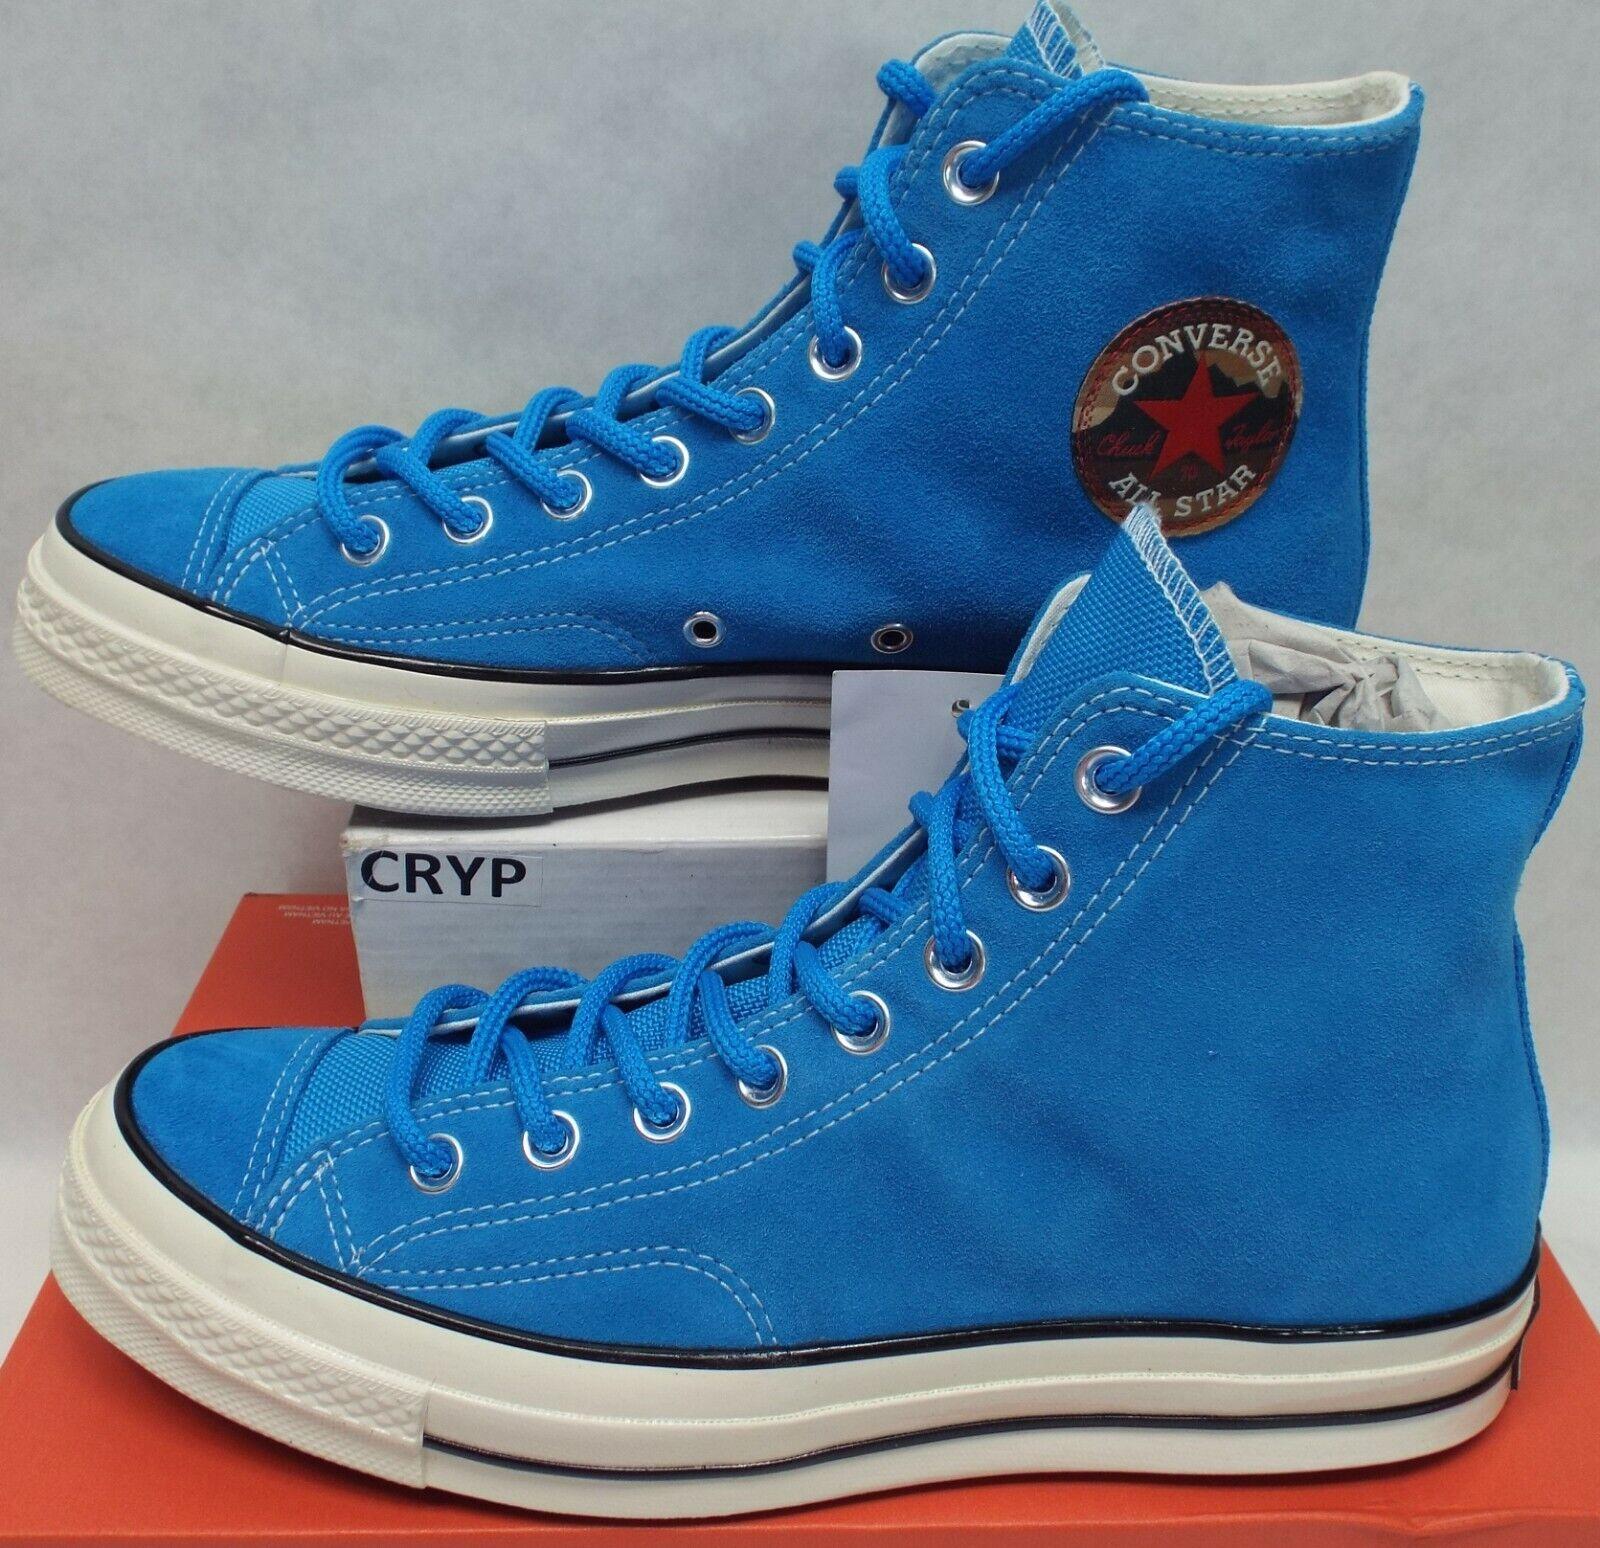 Mens 5.5 Womens 7.5 Converse Chuck 70 CT Hi bluee Hero Suede shoes  95 162370C